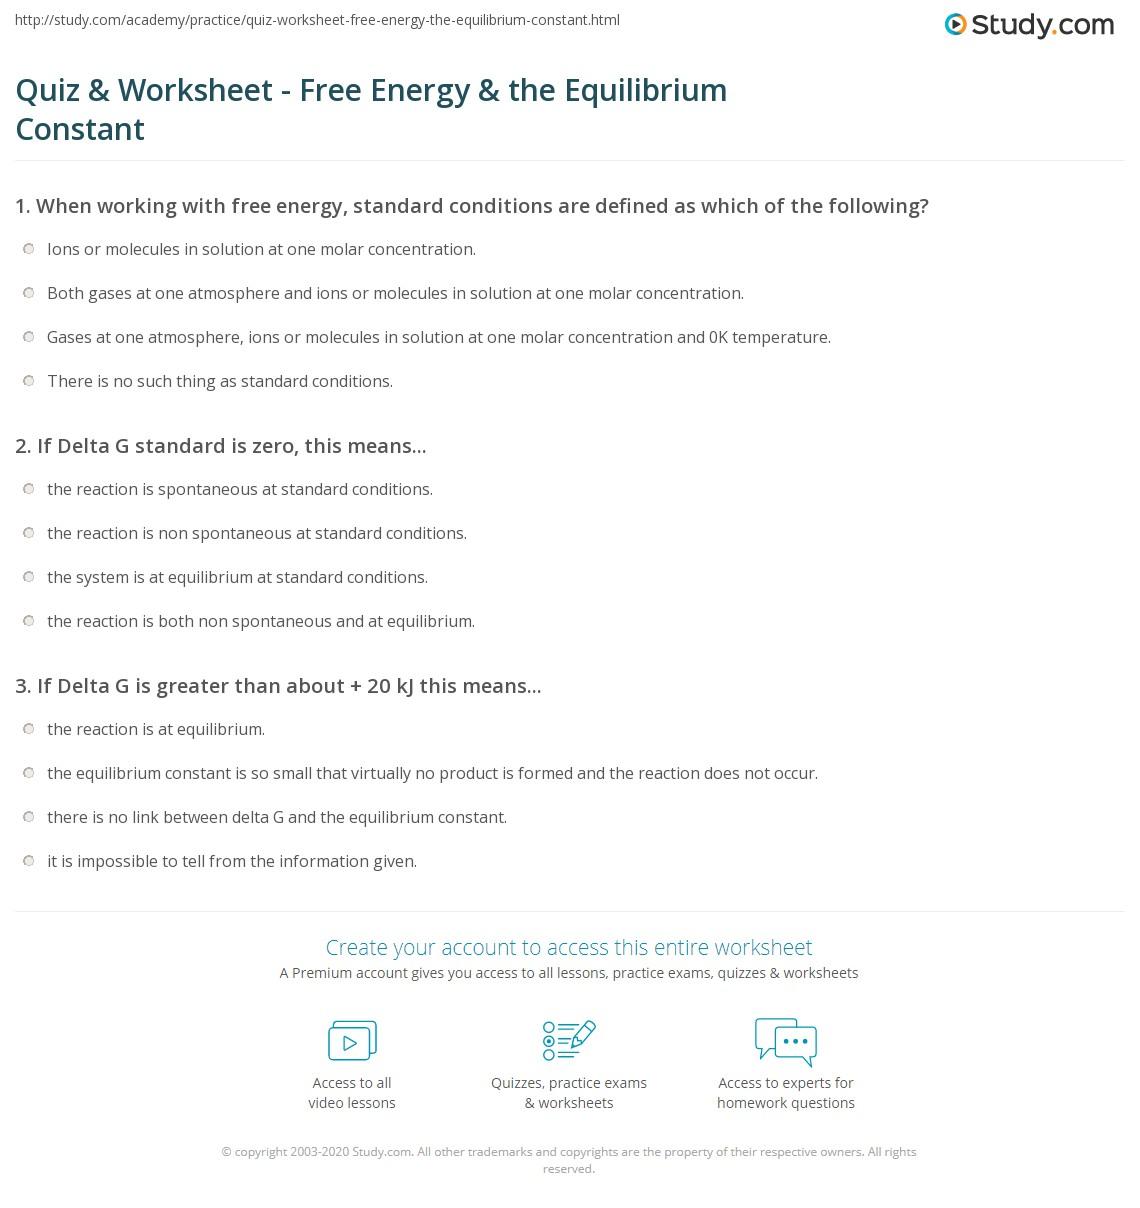 Quiz W Ksheet Free Energy Equilibrium C St Nt Study